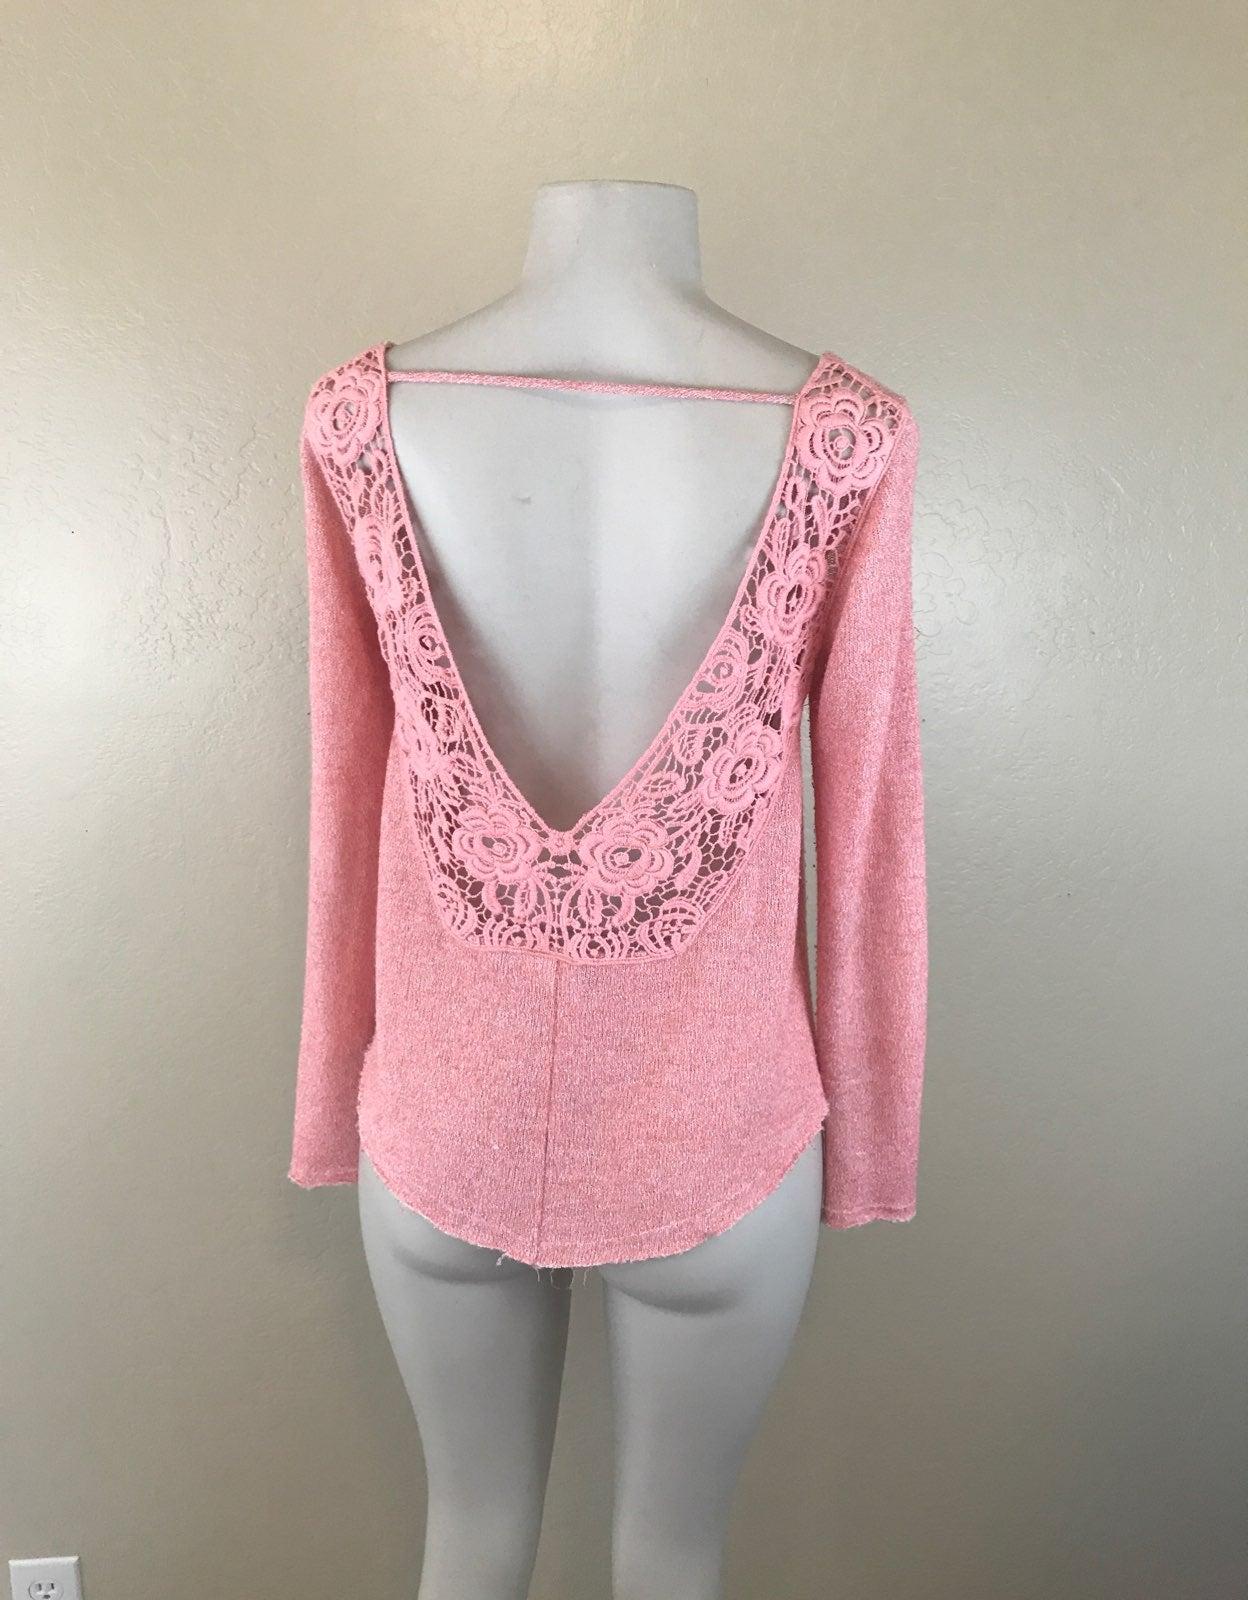 Buckle Daytrip Pink Crochet S